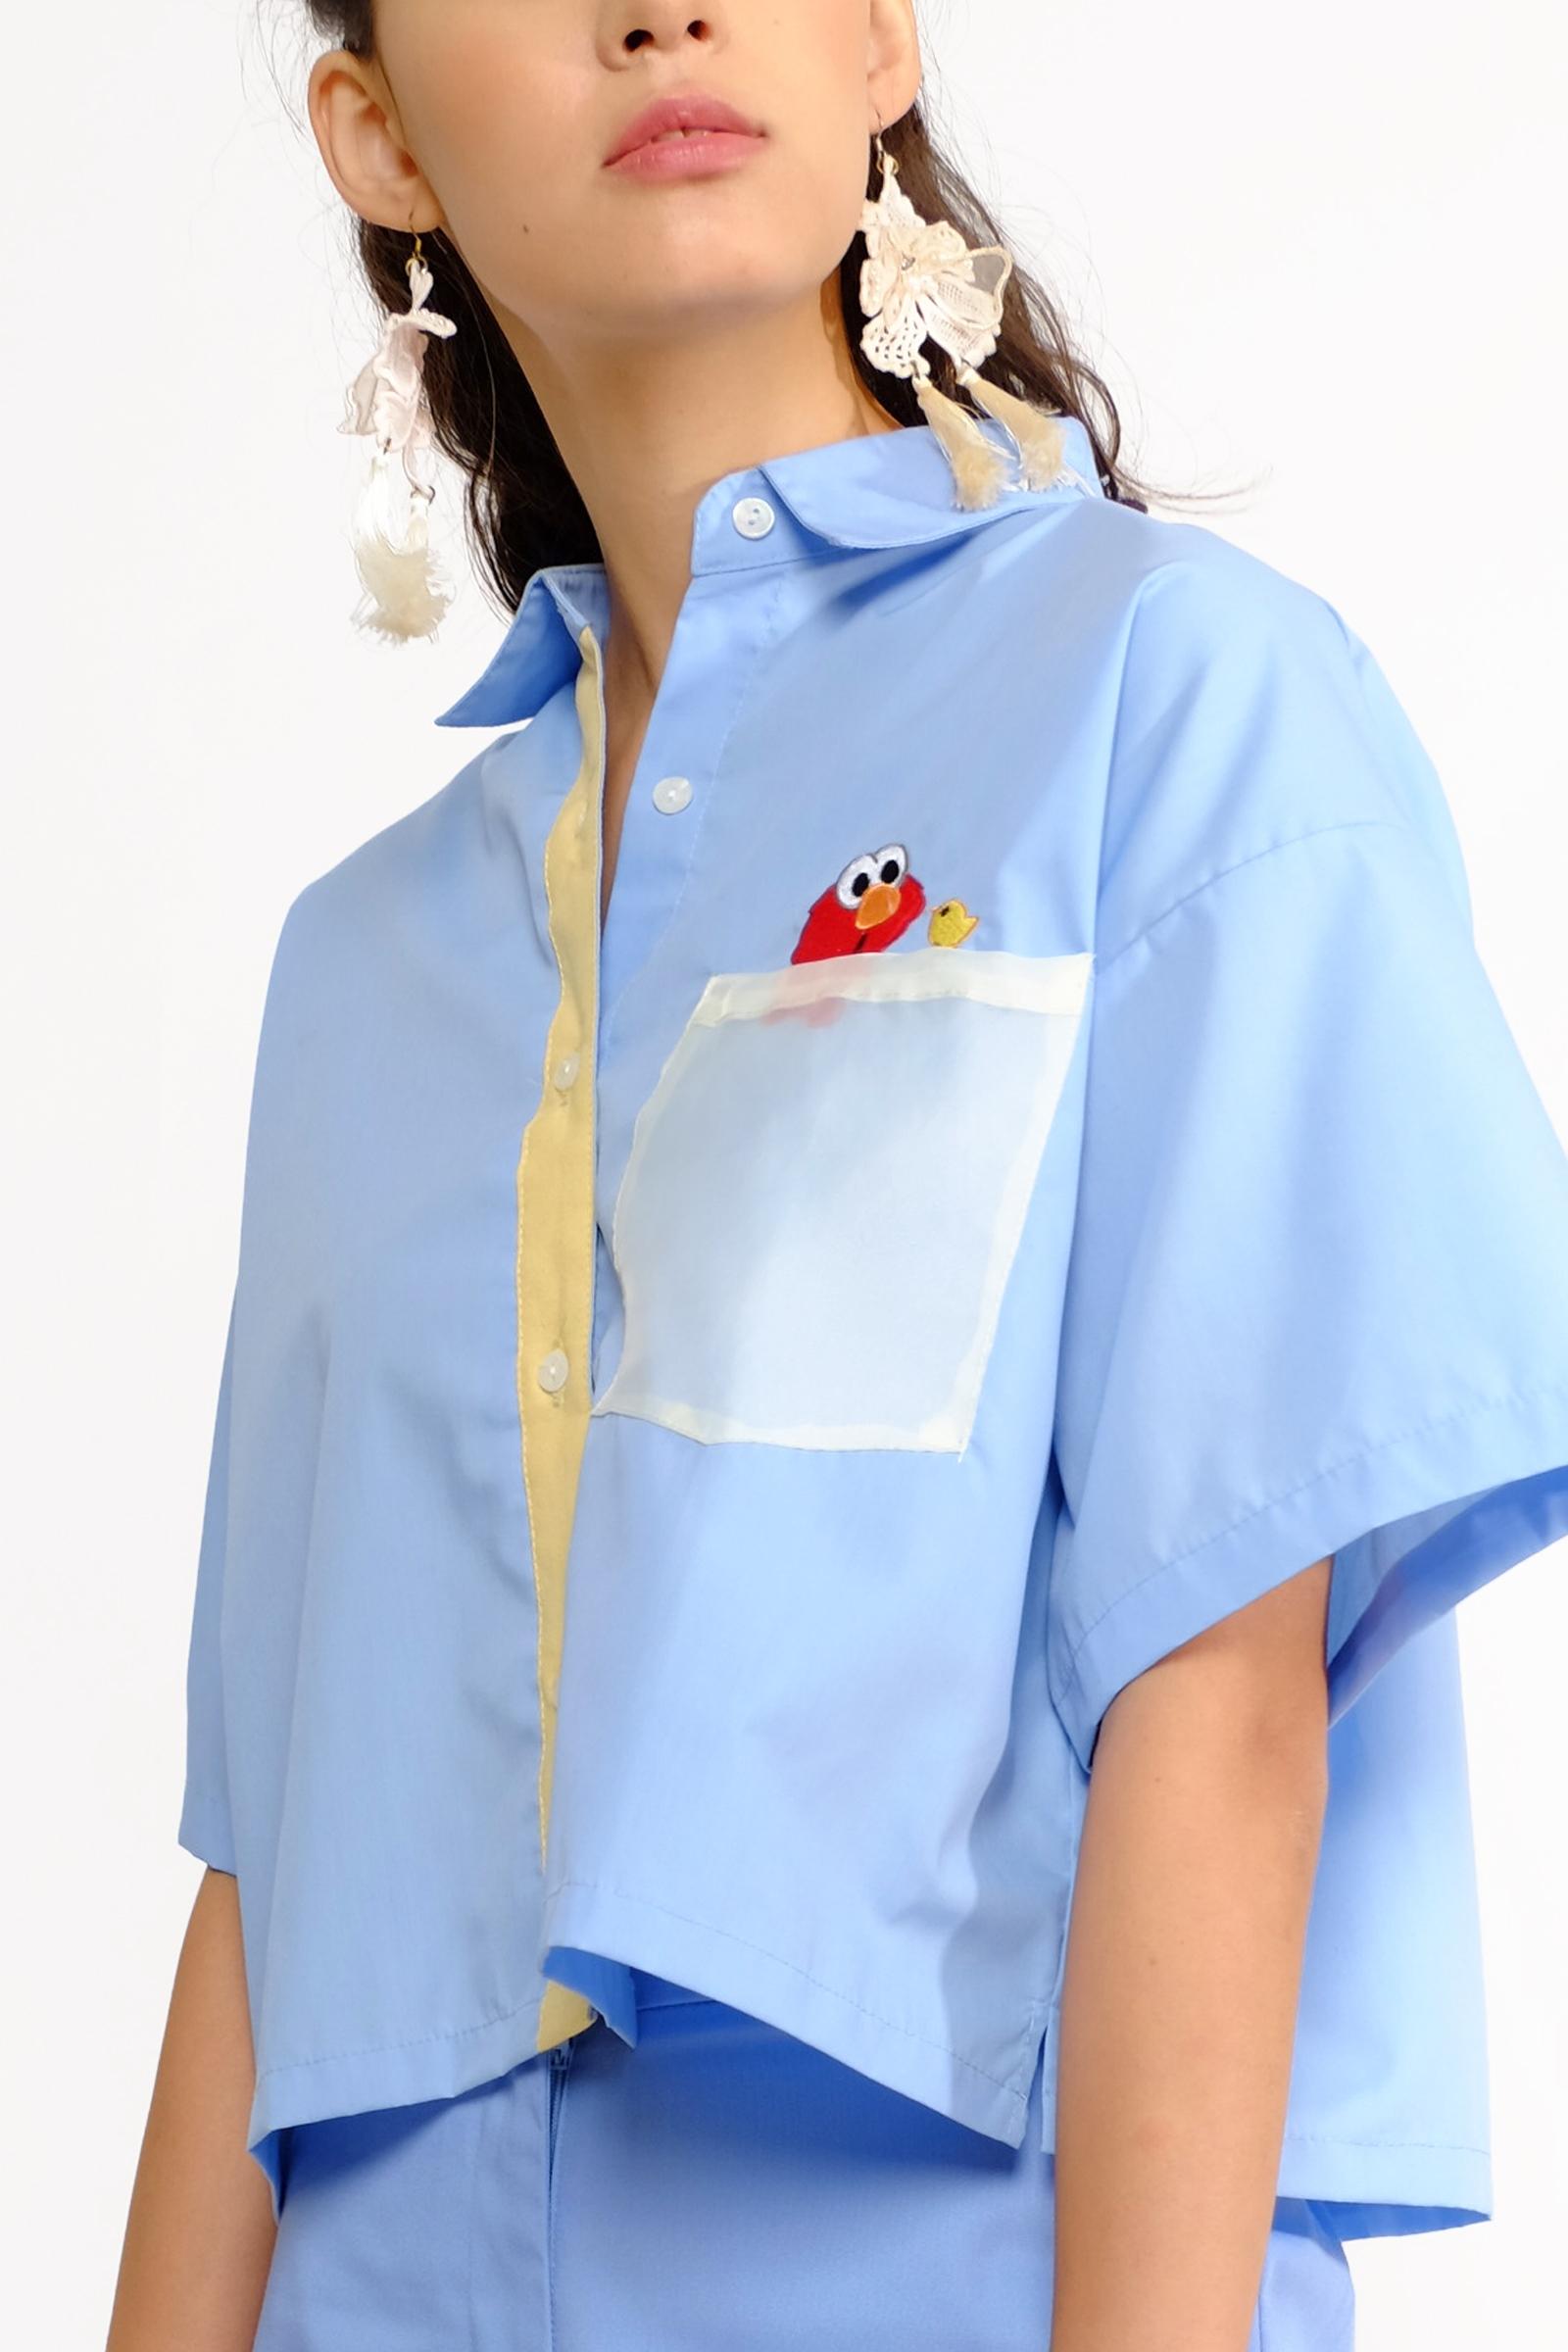 Picture of Peekaboo Shirt Softblue